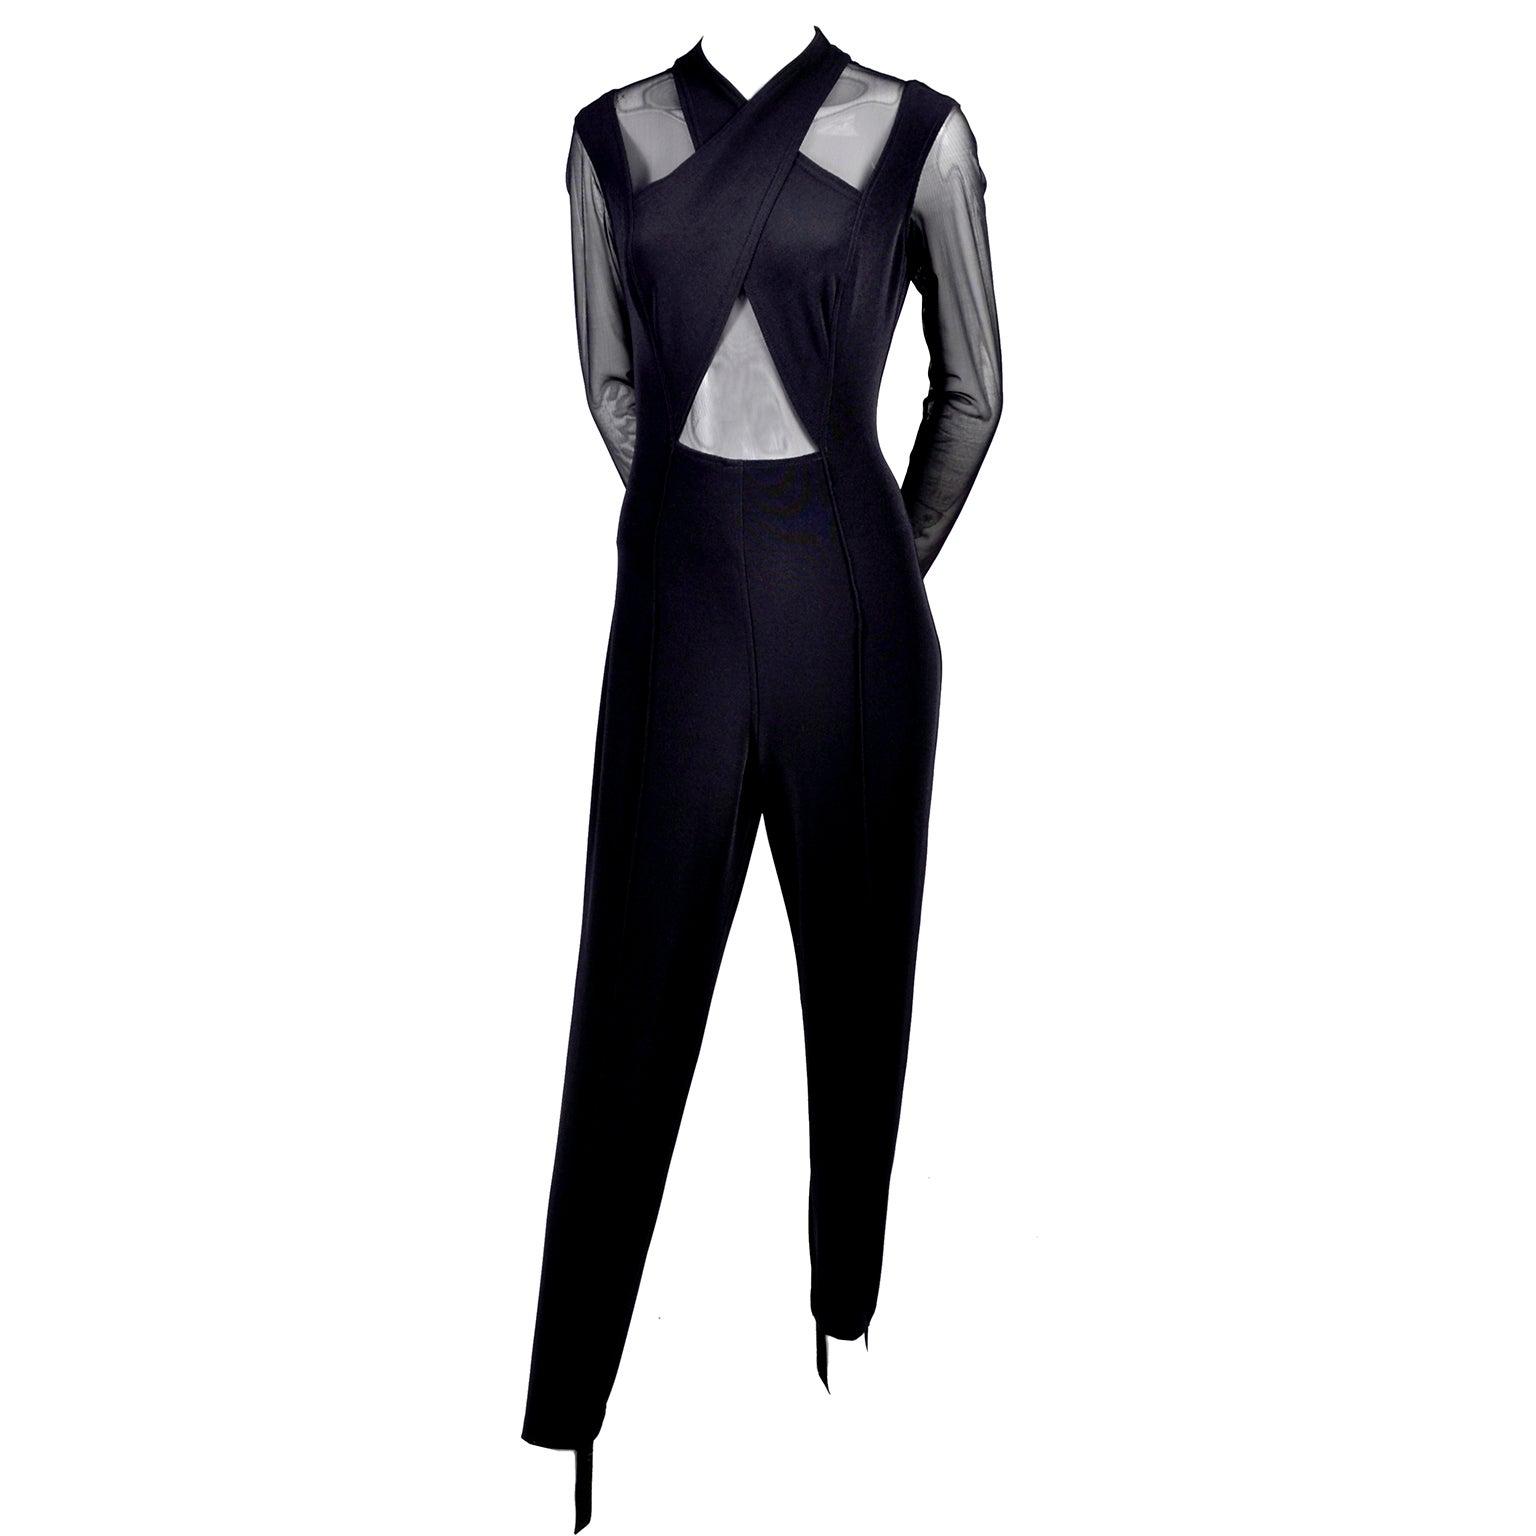 10d71a065b4b2 Black Stretch Tadashi Vintage Jumpsuit With Stirrups Sheer Illusion Halter  at 1stdibs